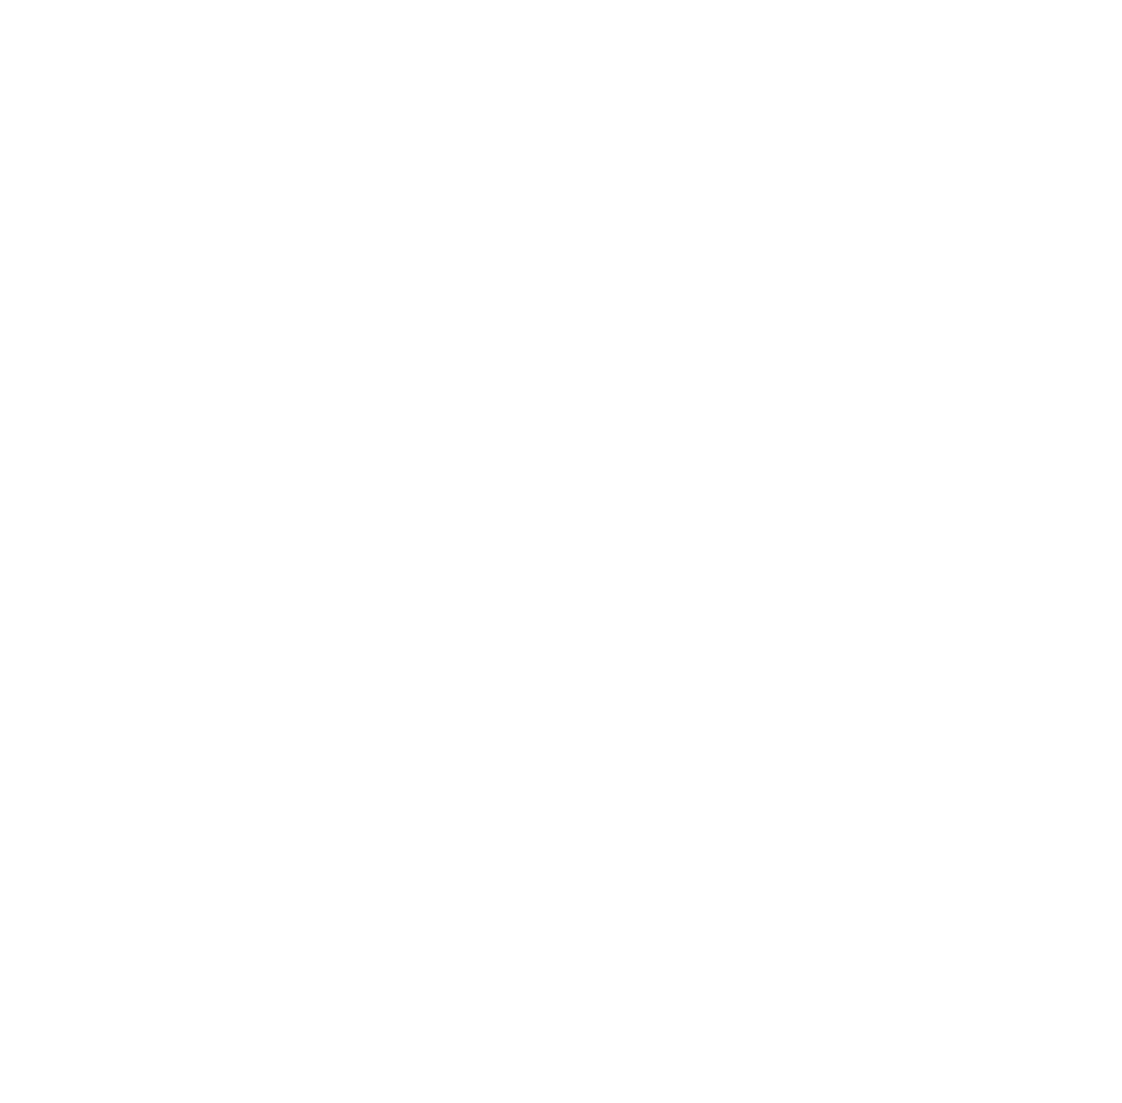 studio miez logo wit rond